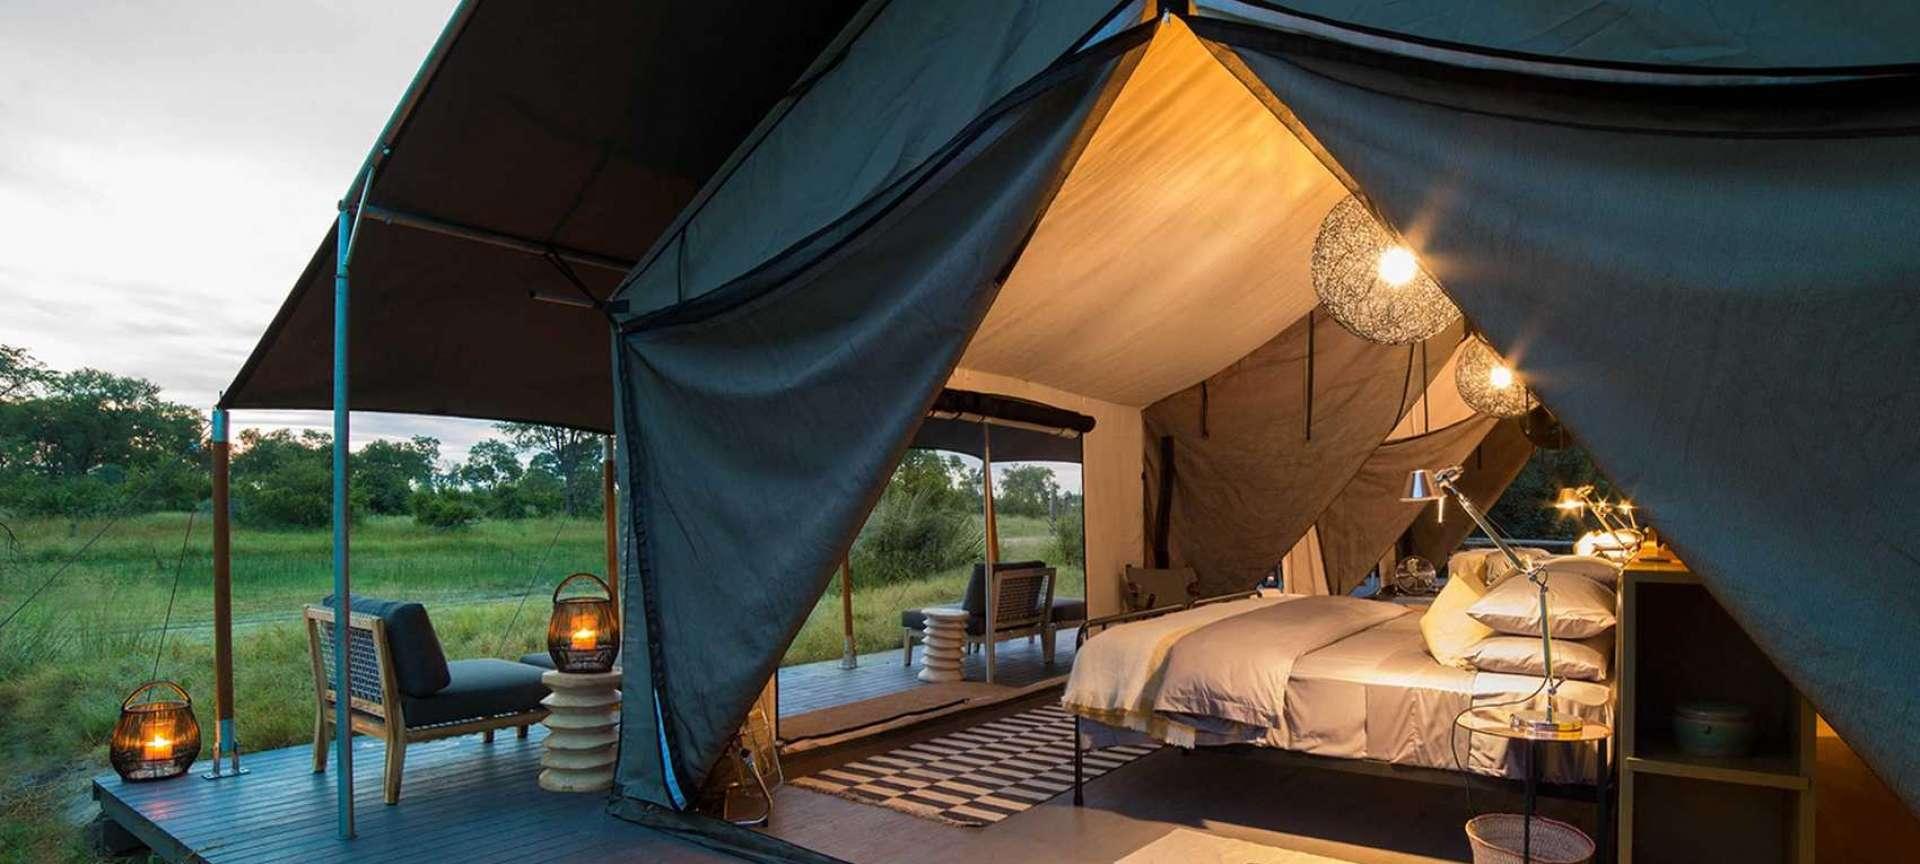 Mobile camping safaris in Africa - Africa Wildlife Safaris